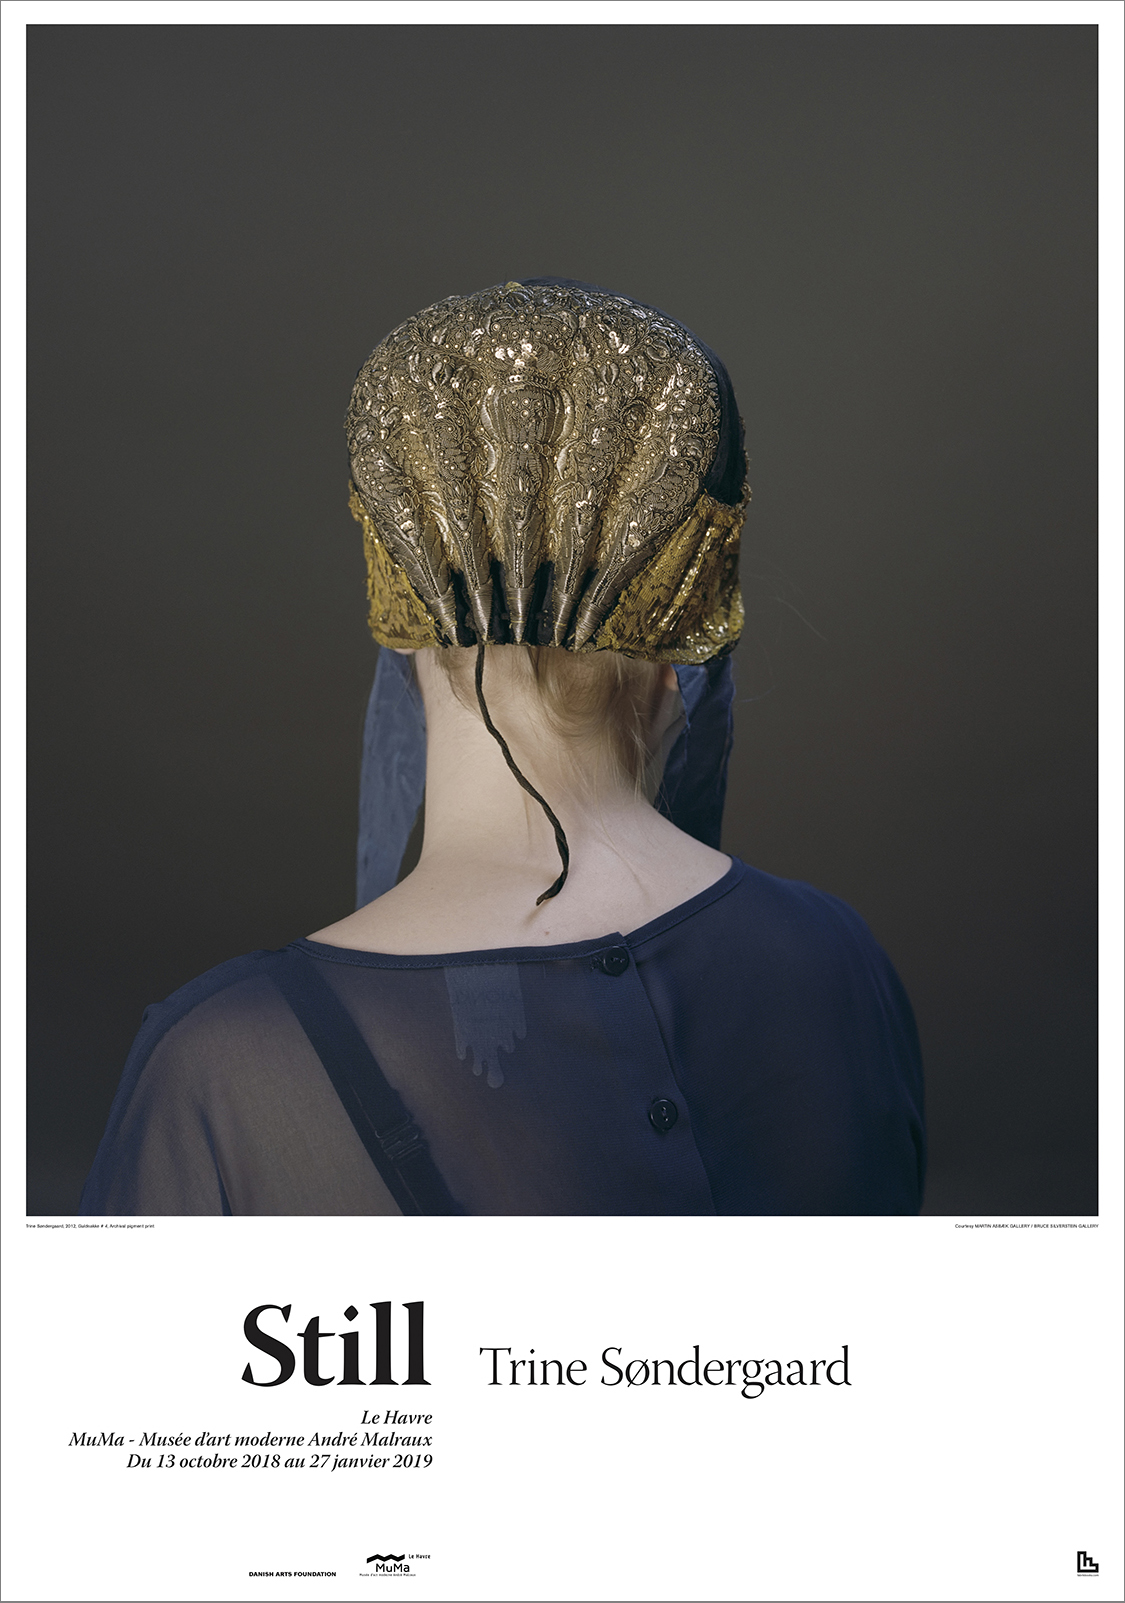 Poster by Trine Søndergaard measuring 70 x 100 cm